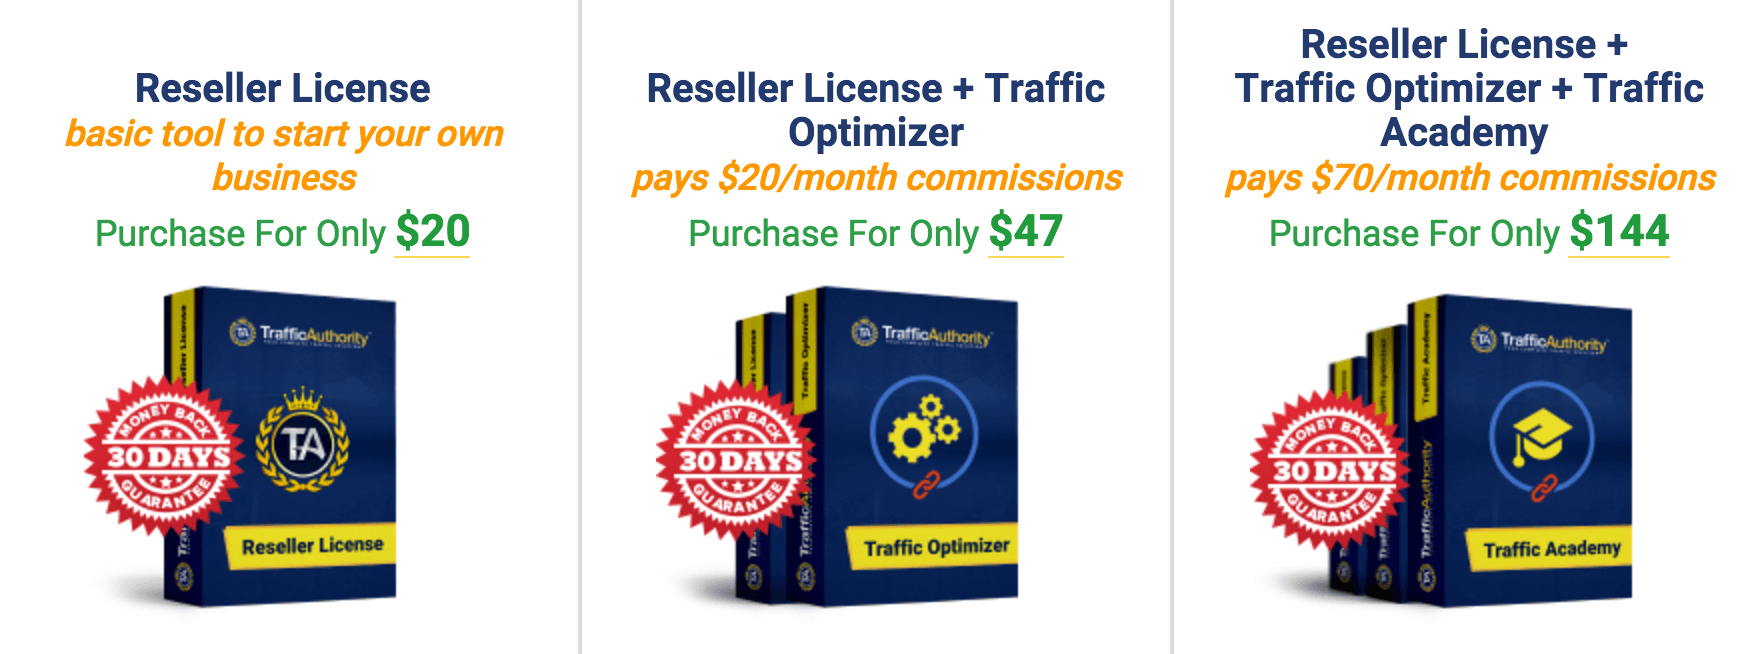 reseller-license